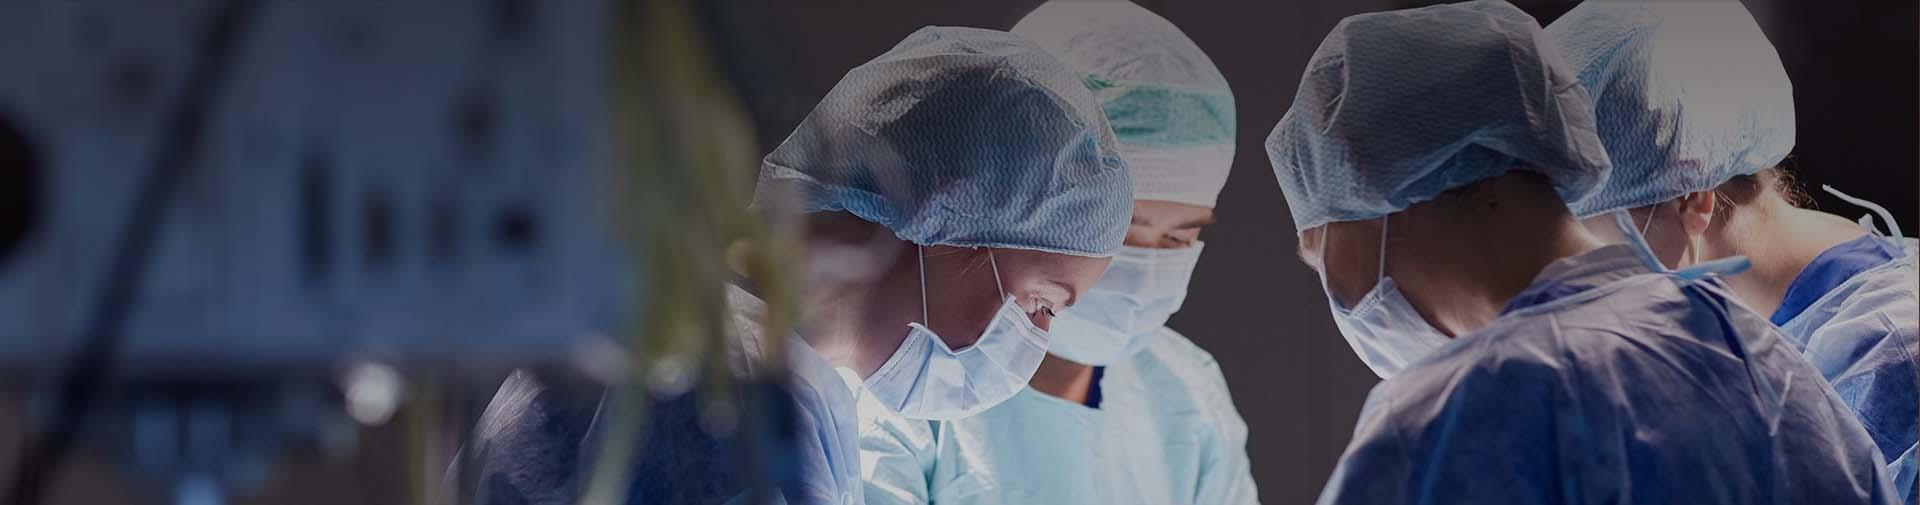 kidney transplants are an vital treatment option for chronic kidney disease